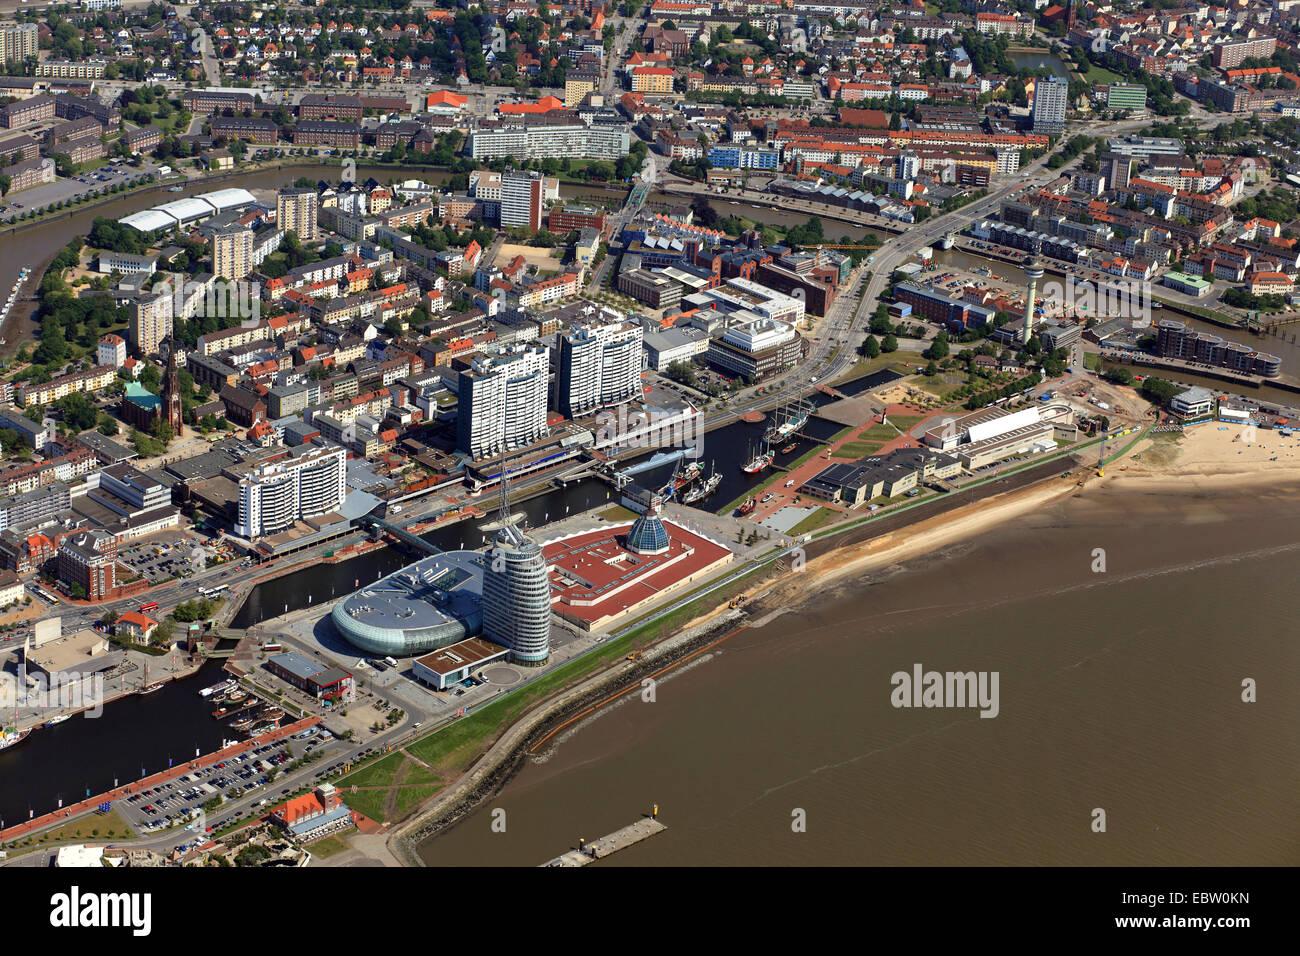 German Maritime Museum, Atlantic Hotel, Mediterraneo, oben Columbus-Center, Germany, Bremerhaven Stock Photo